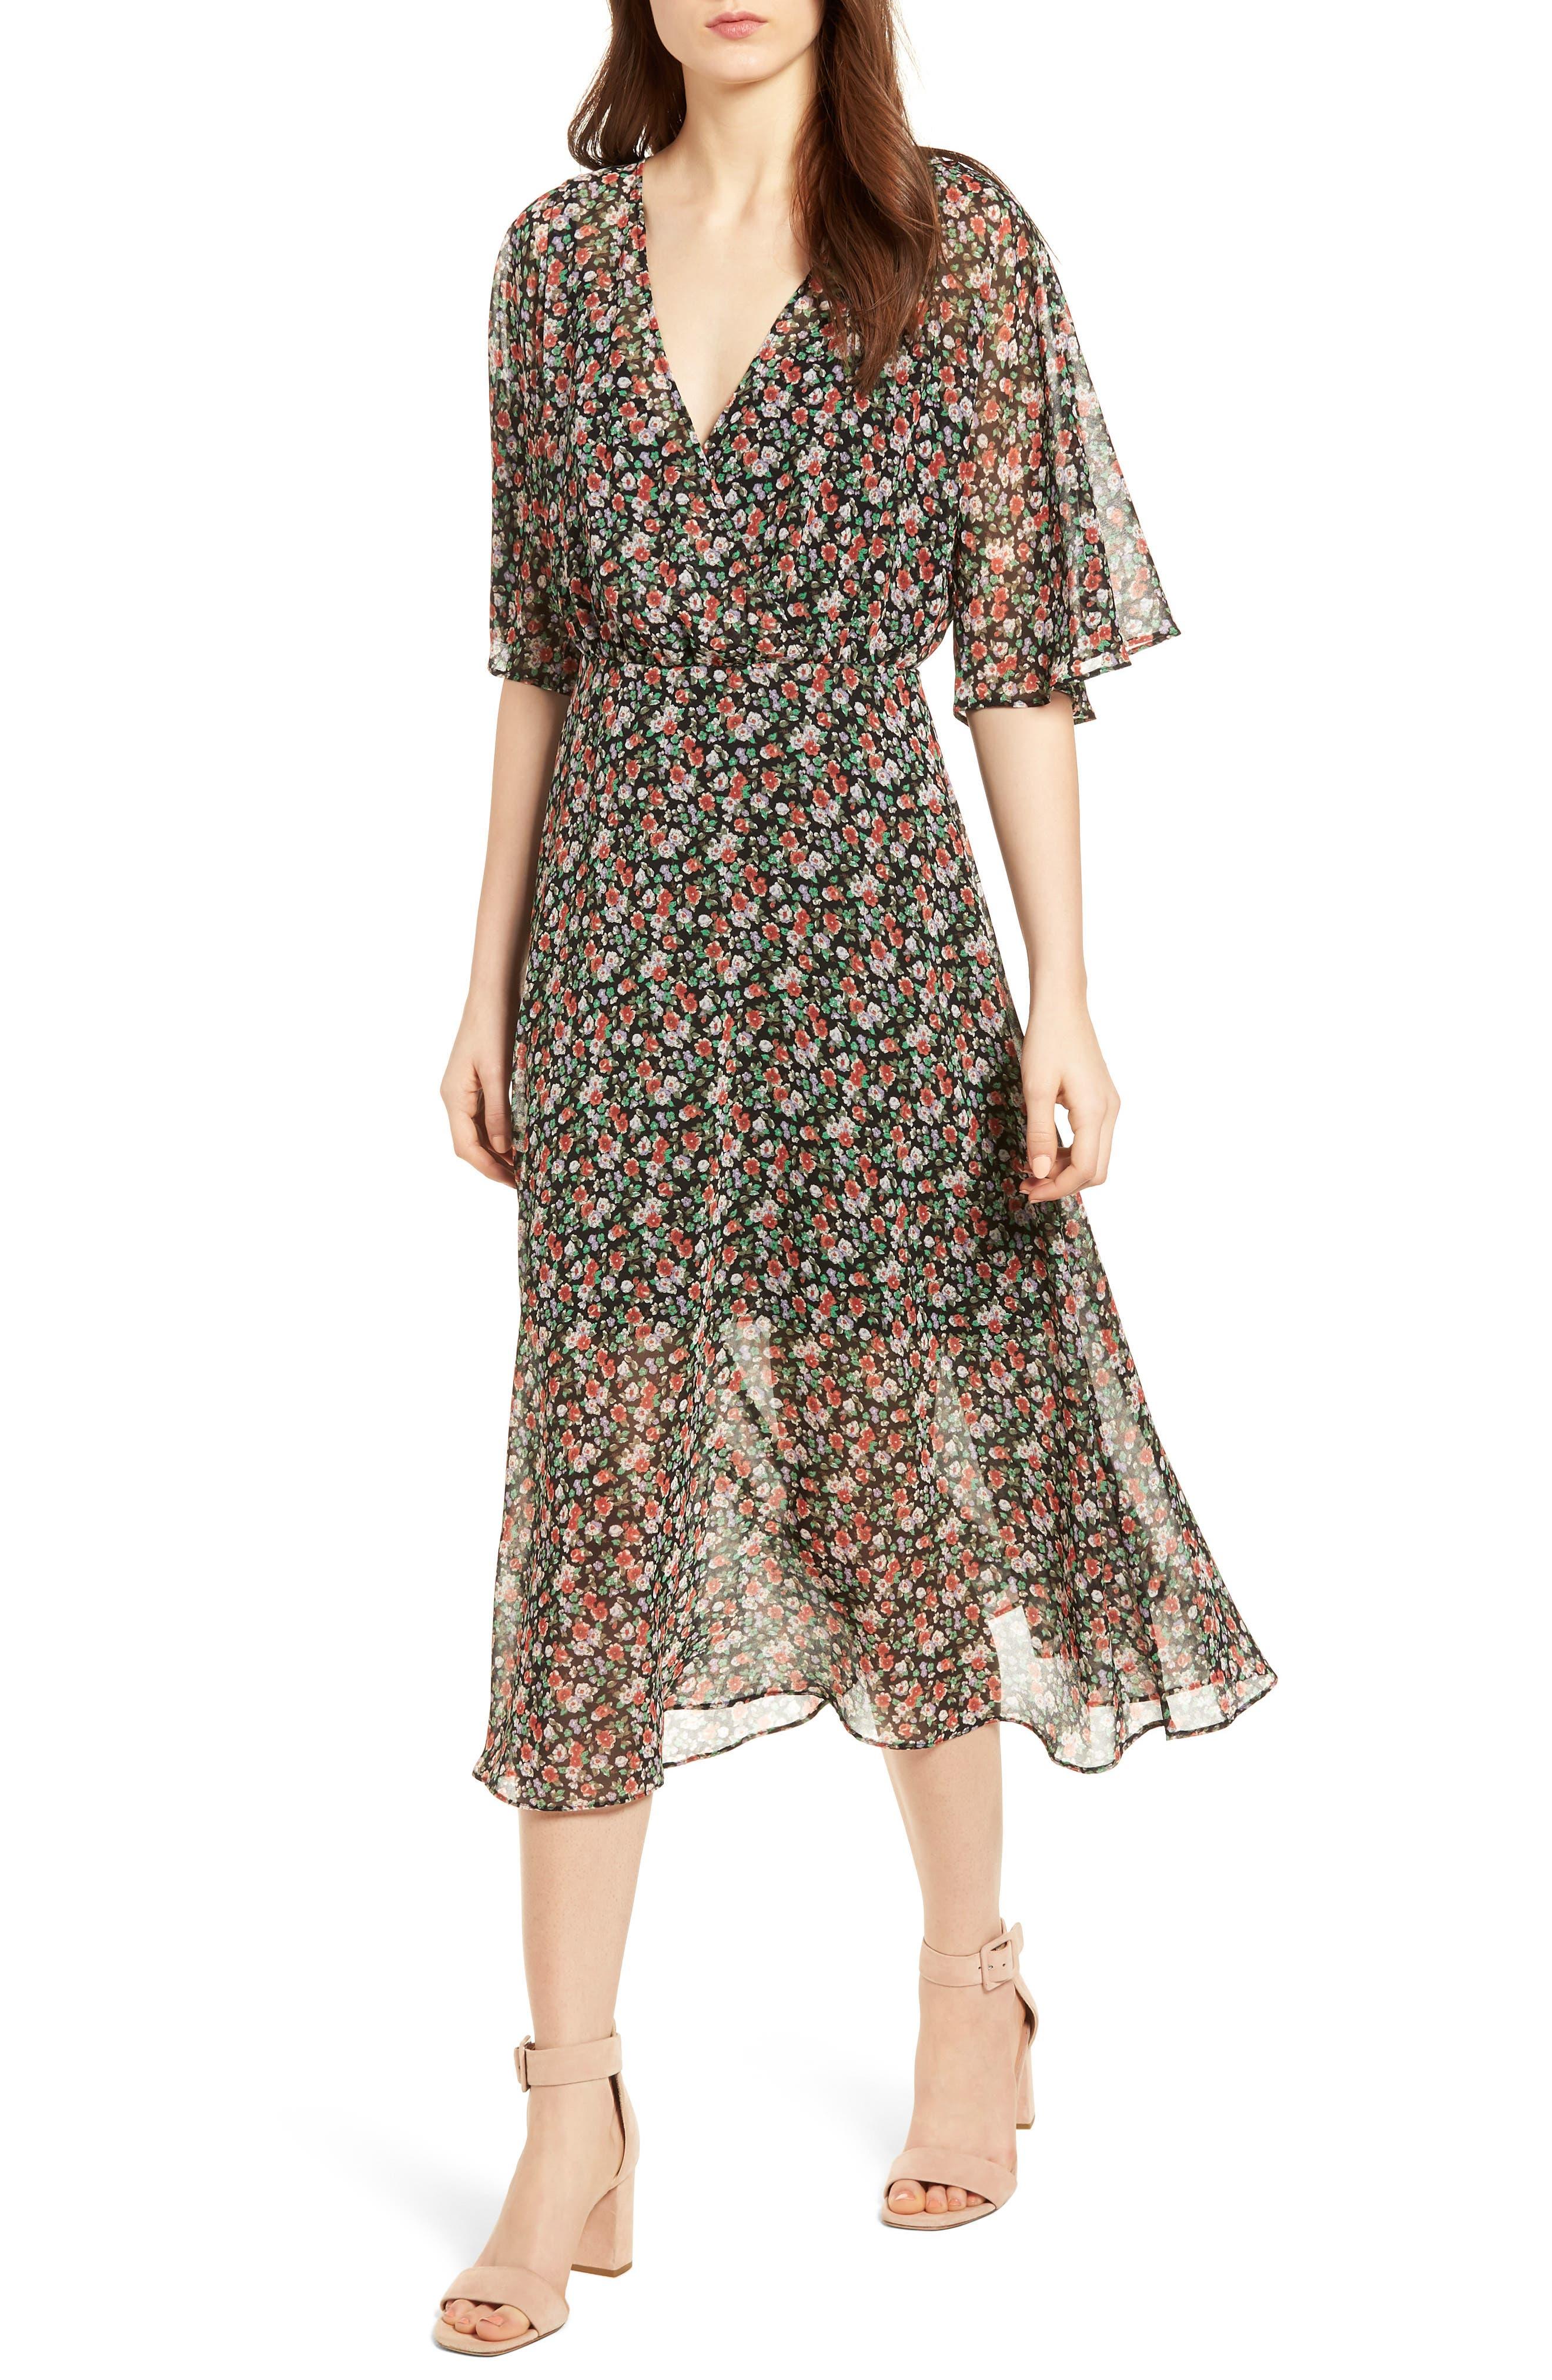 Rebecca Minkoff Ali Dress